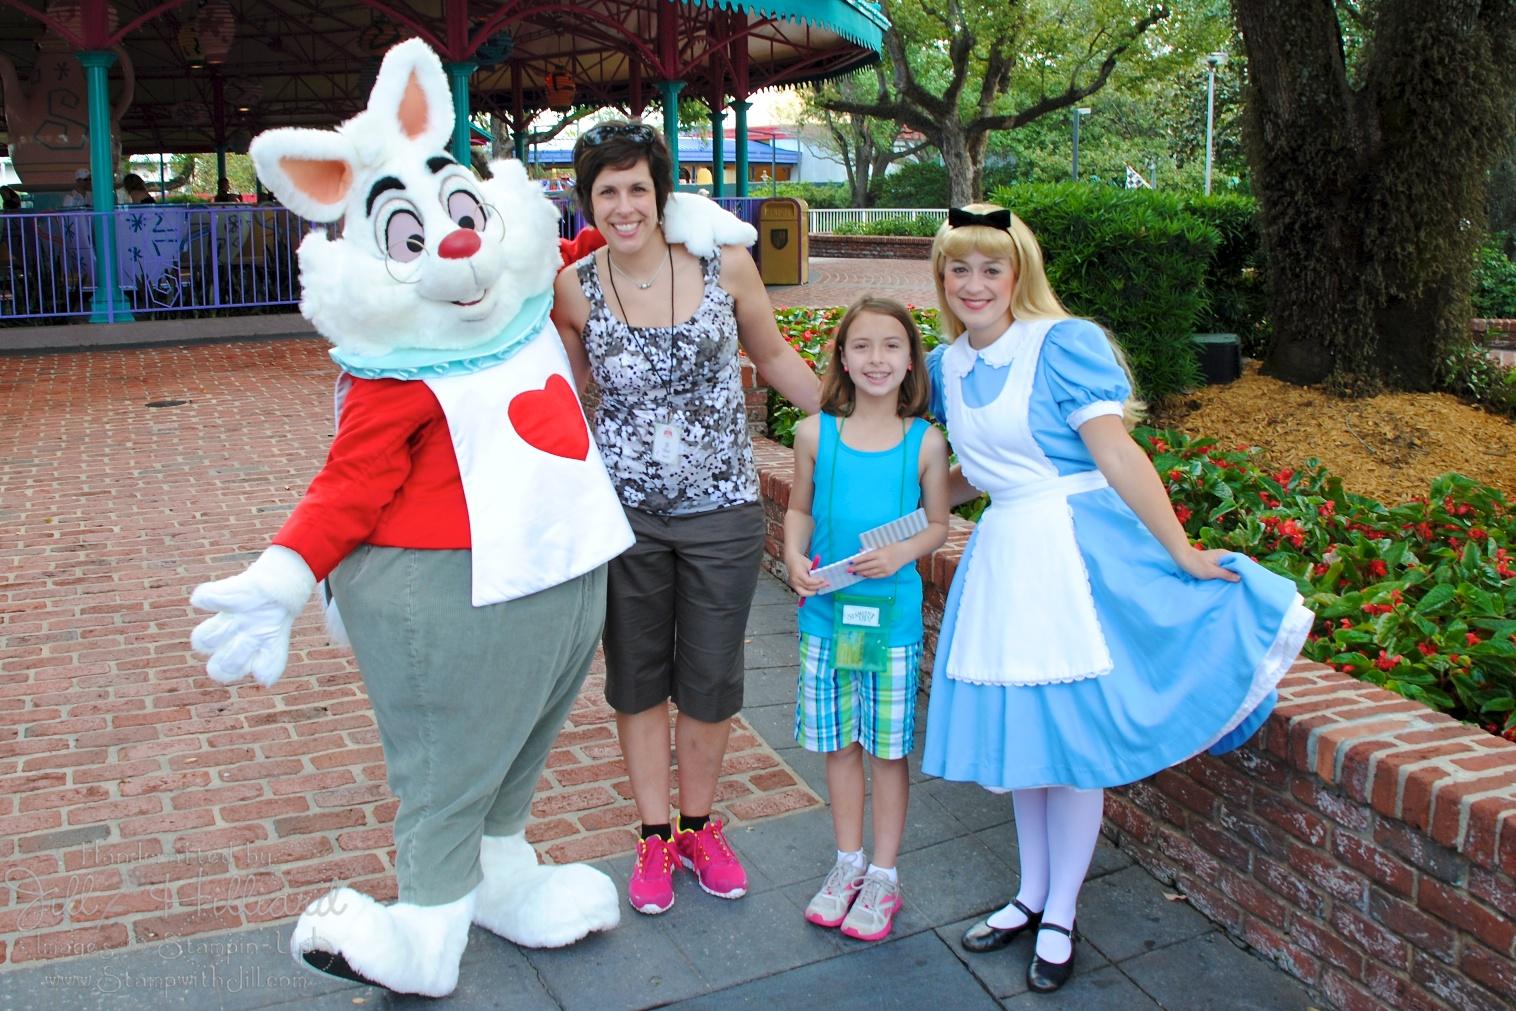 Alice In Wonderland Characters Disney Animals First character  alice    Alice In Wonderland Characters Disney Card Guards